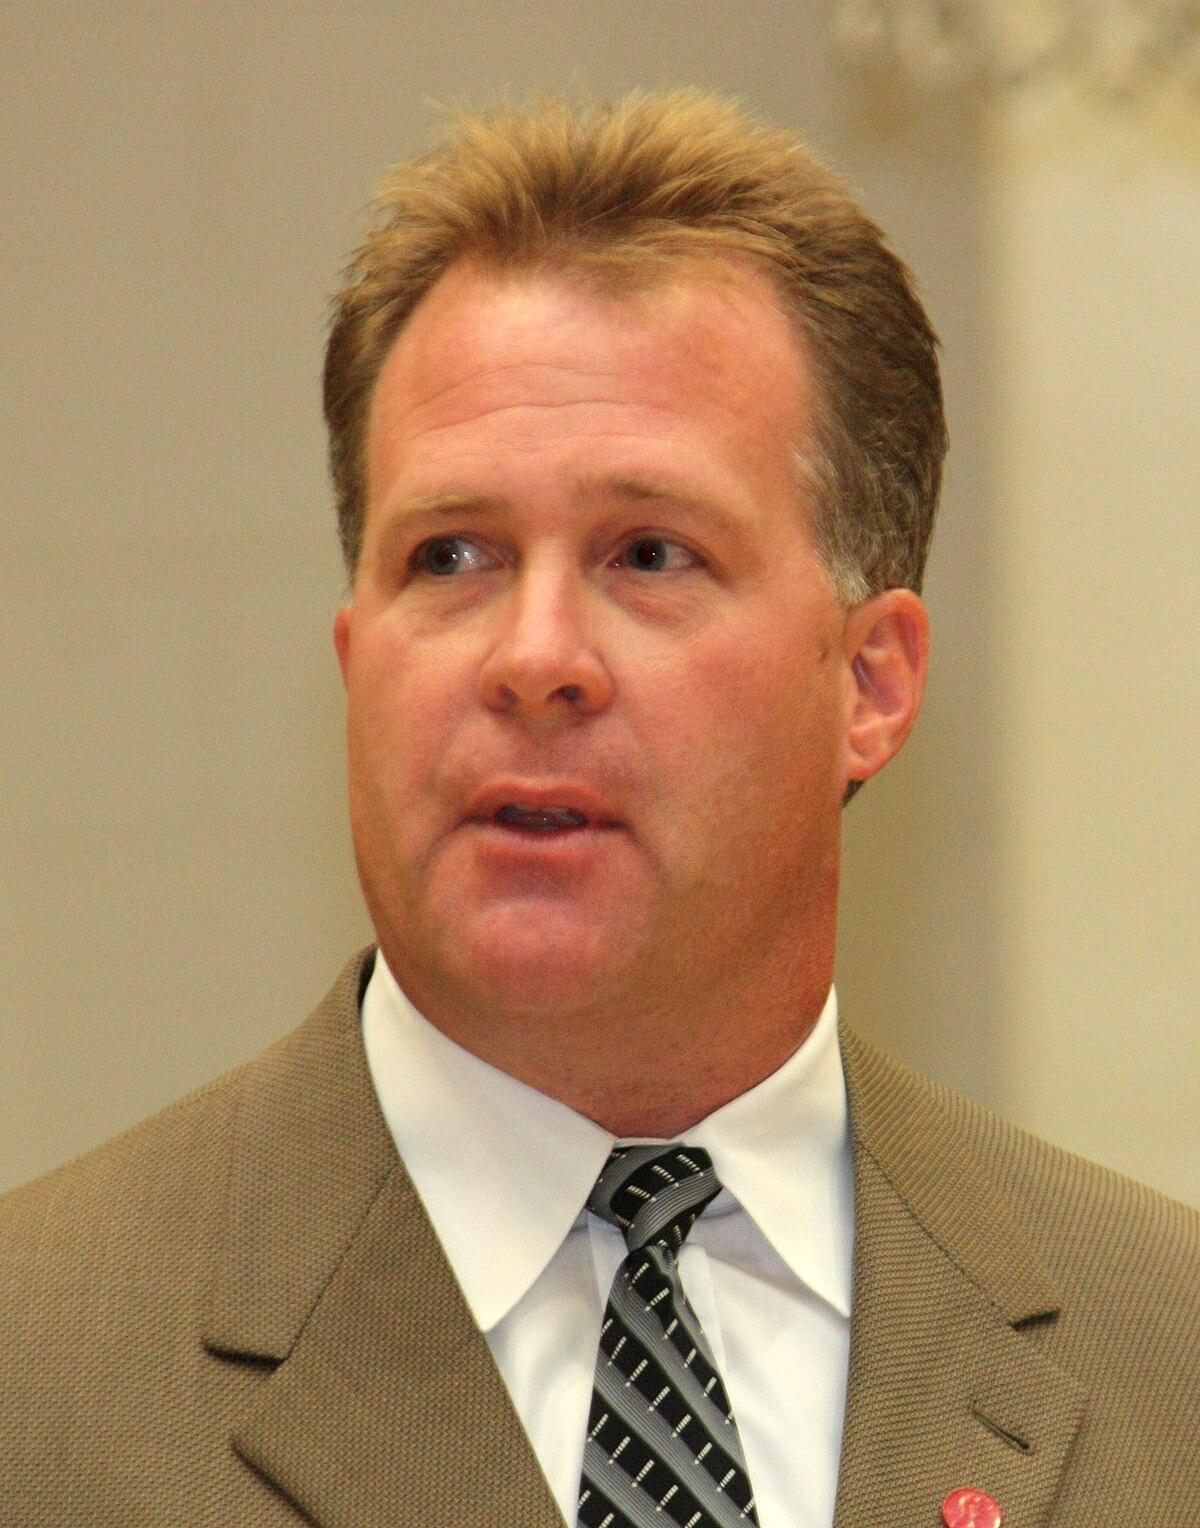 Chris Thieneman Wikipedia